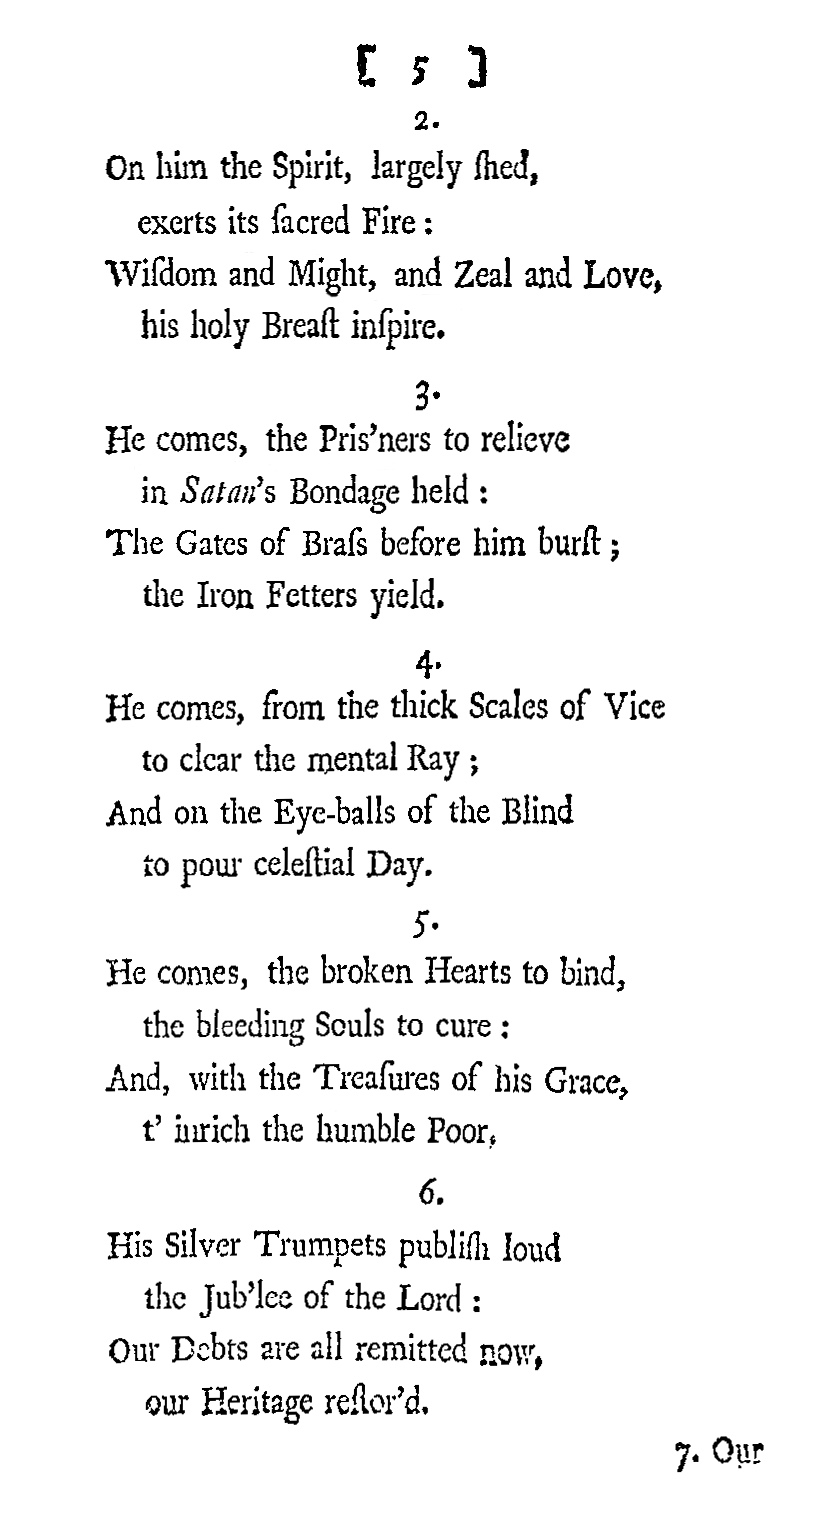 Translations-Paraphrases-1745-9.jpg